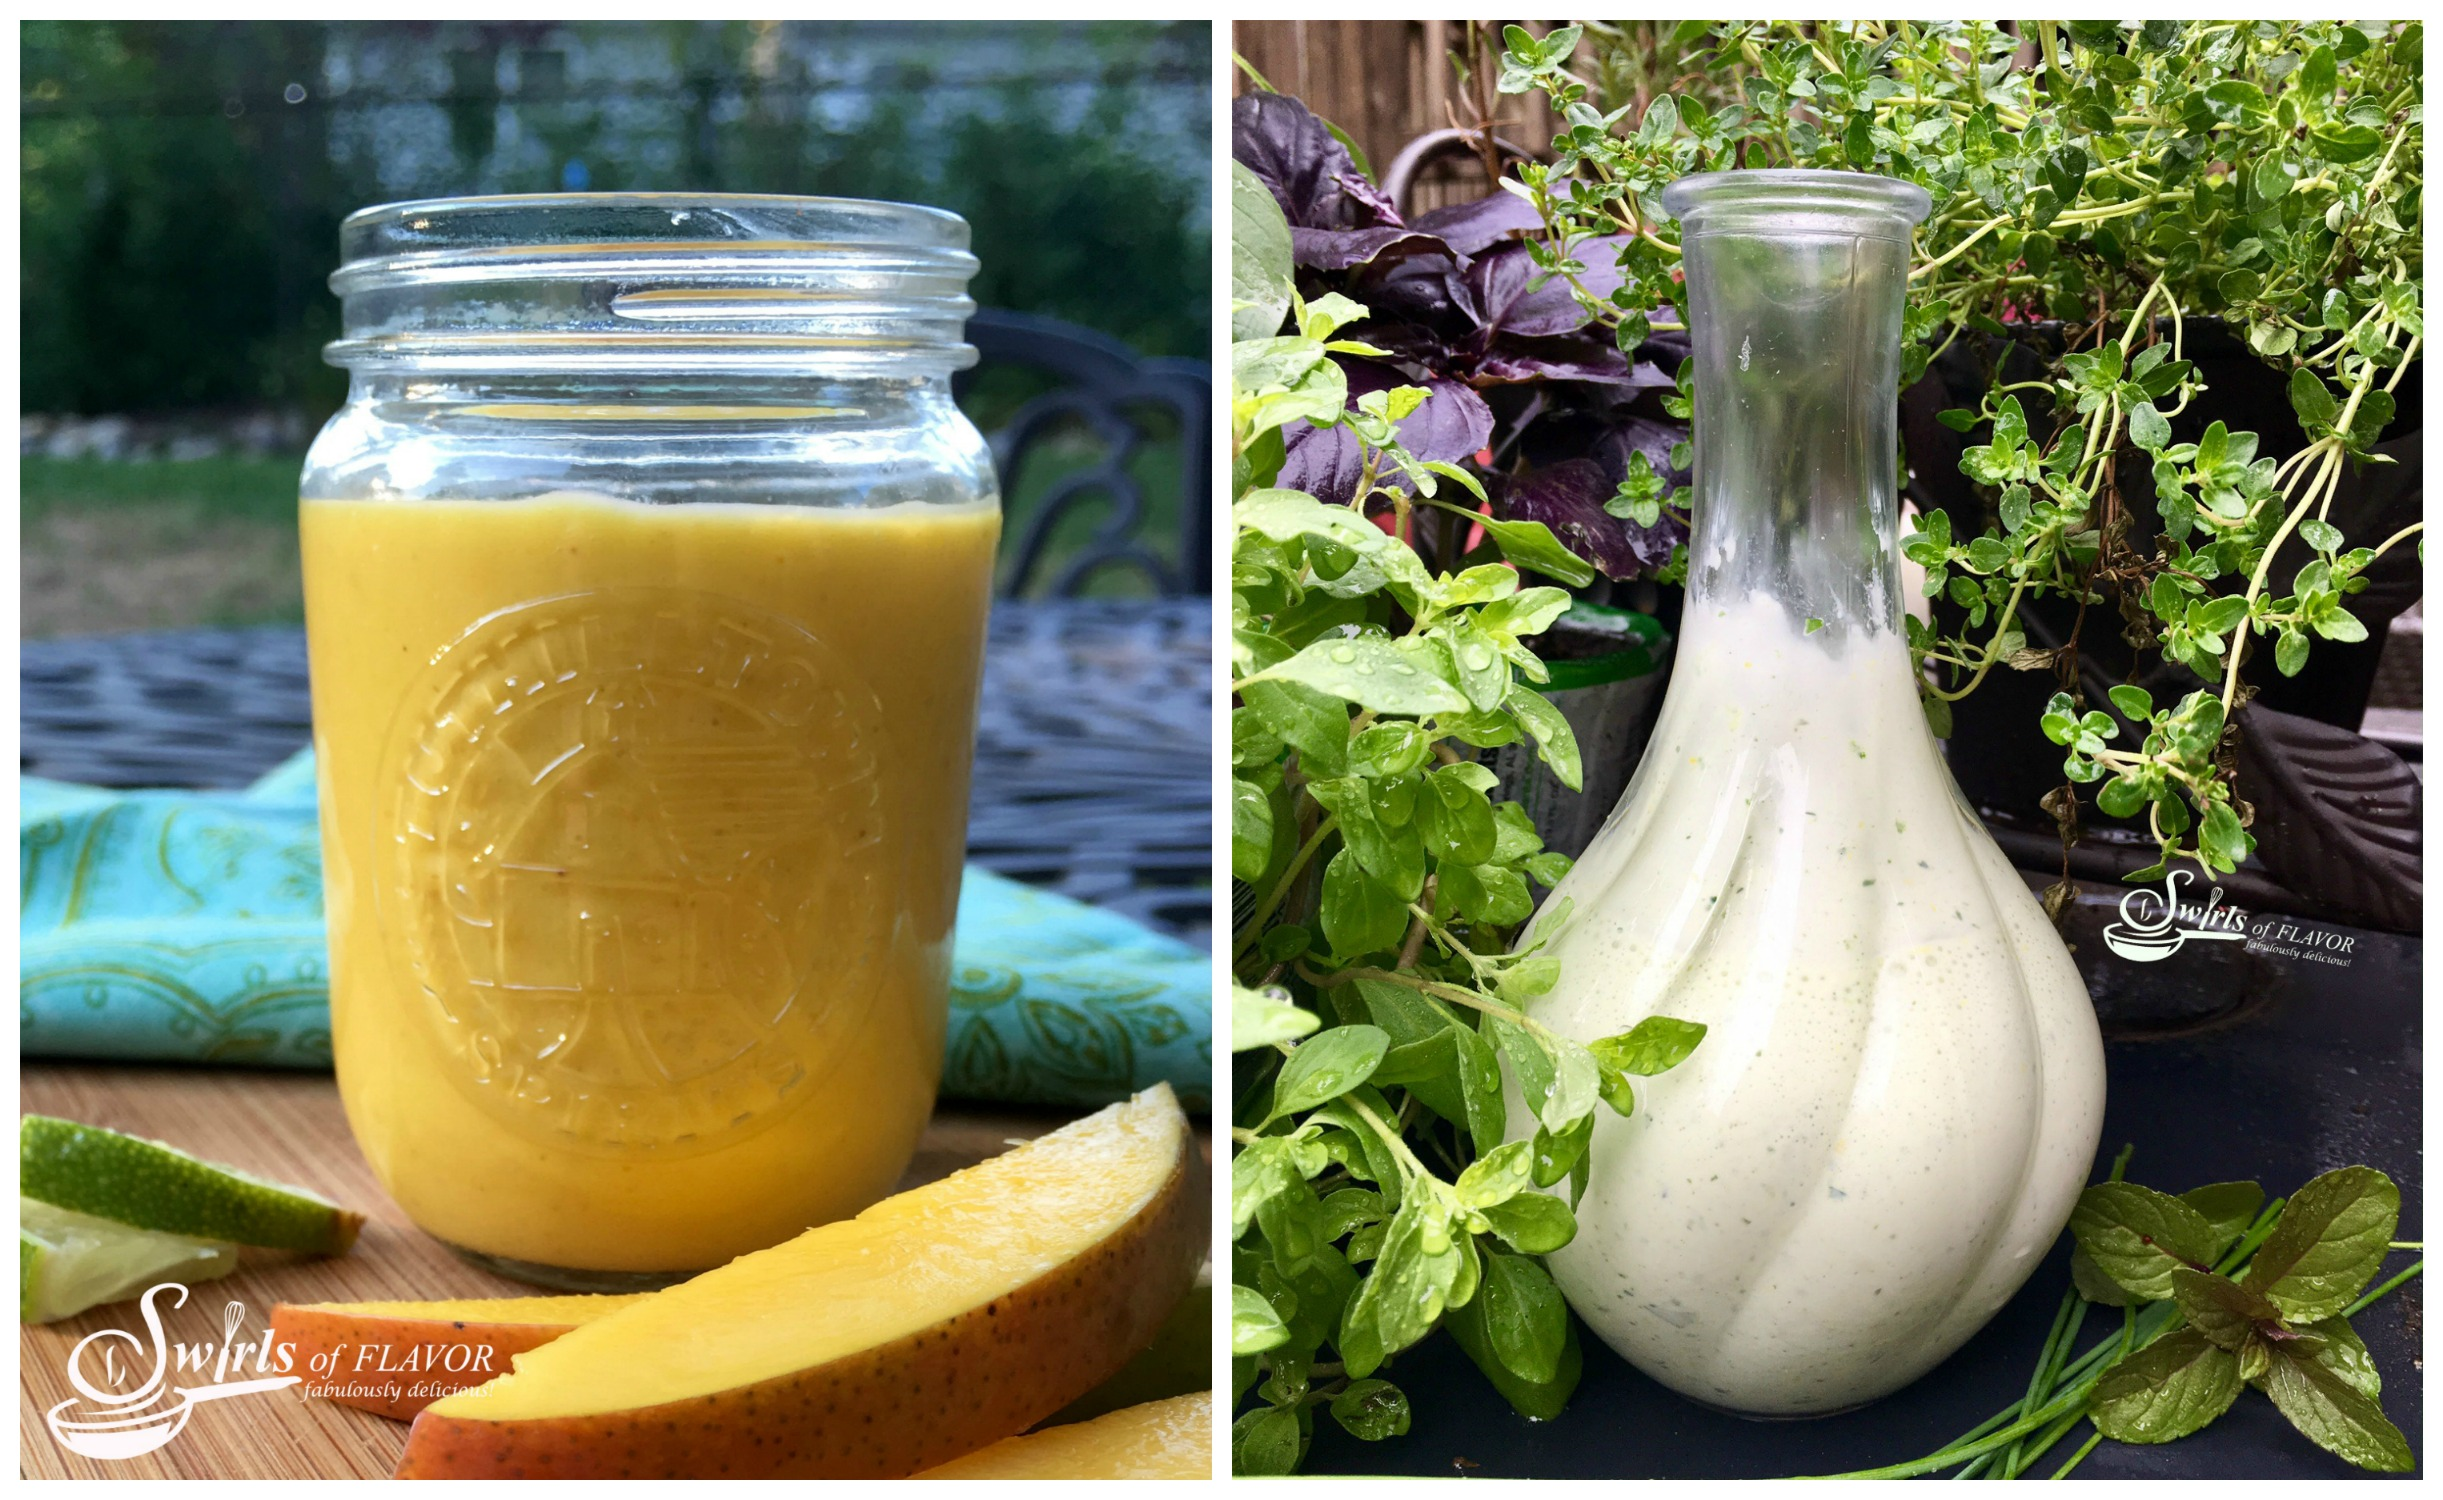 Chipotle Mango vinaigrette and Green Goddess Creamy Salad Dressing